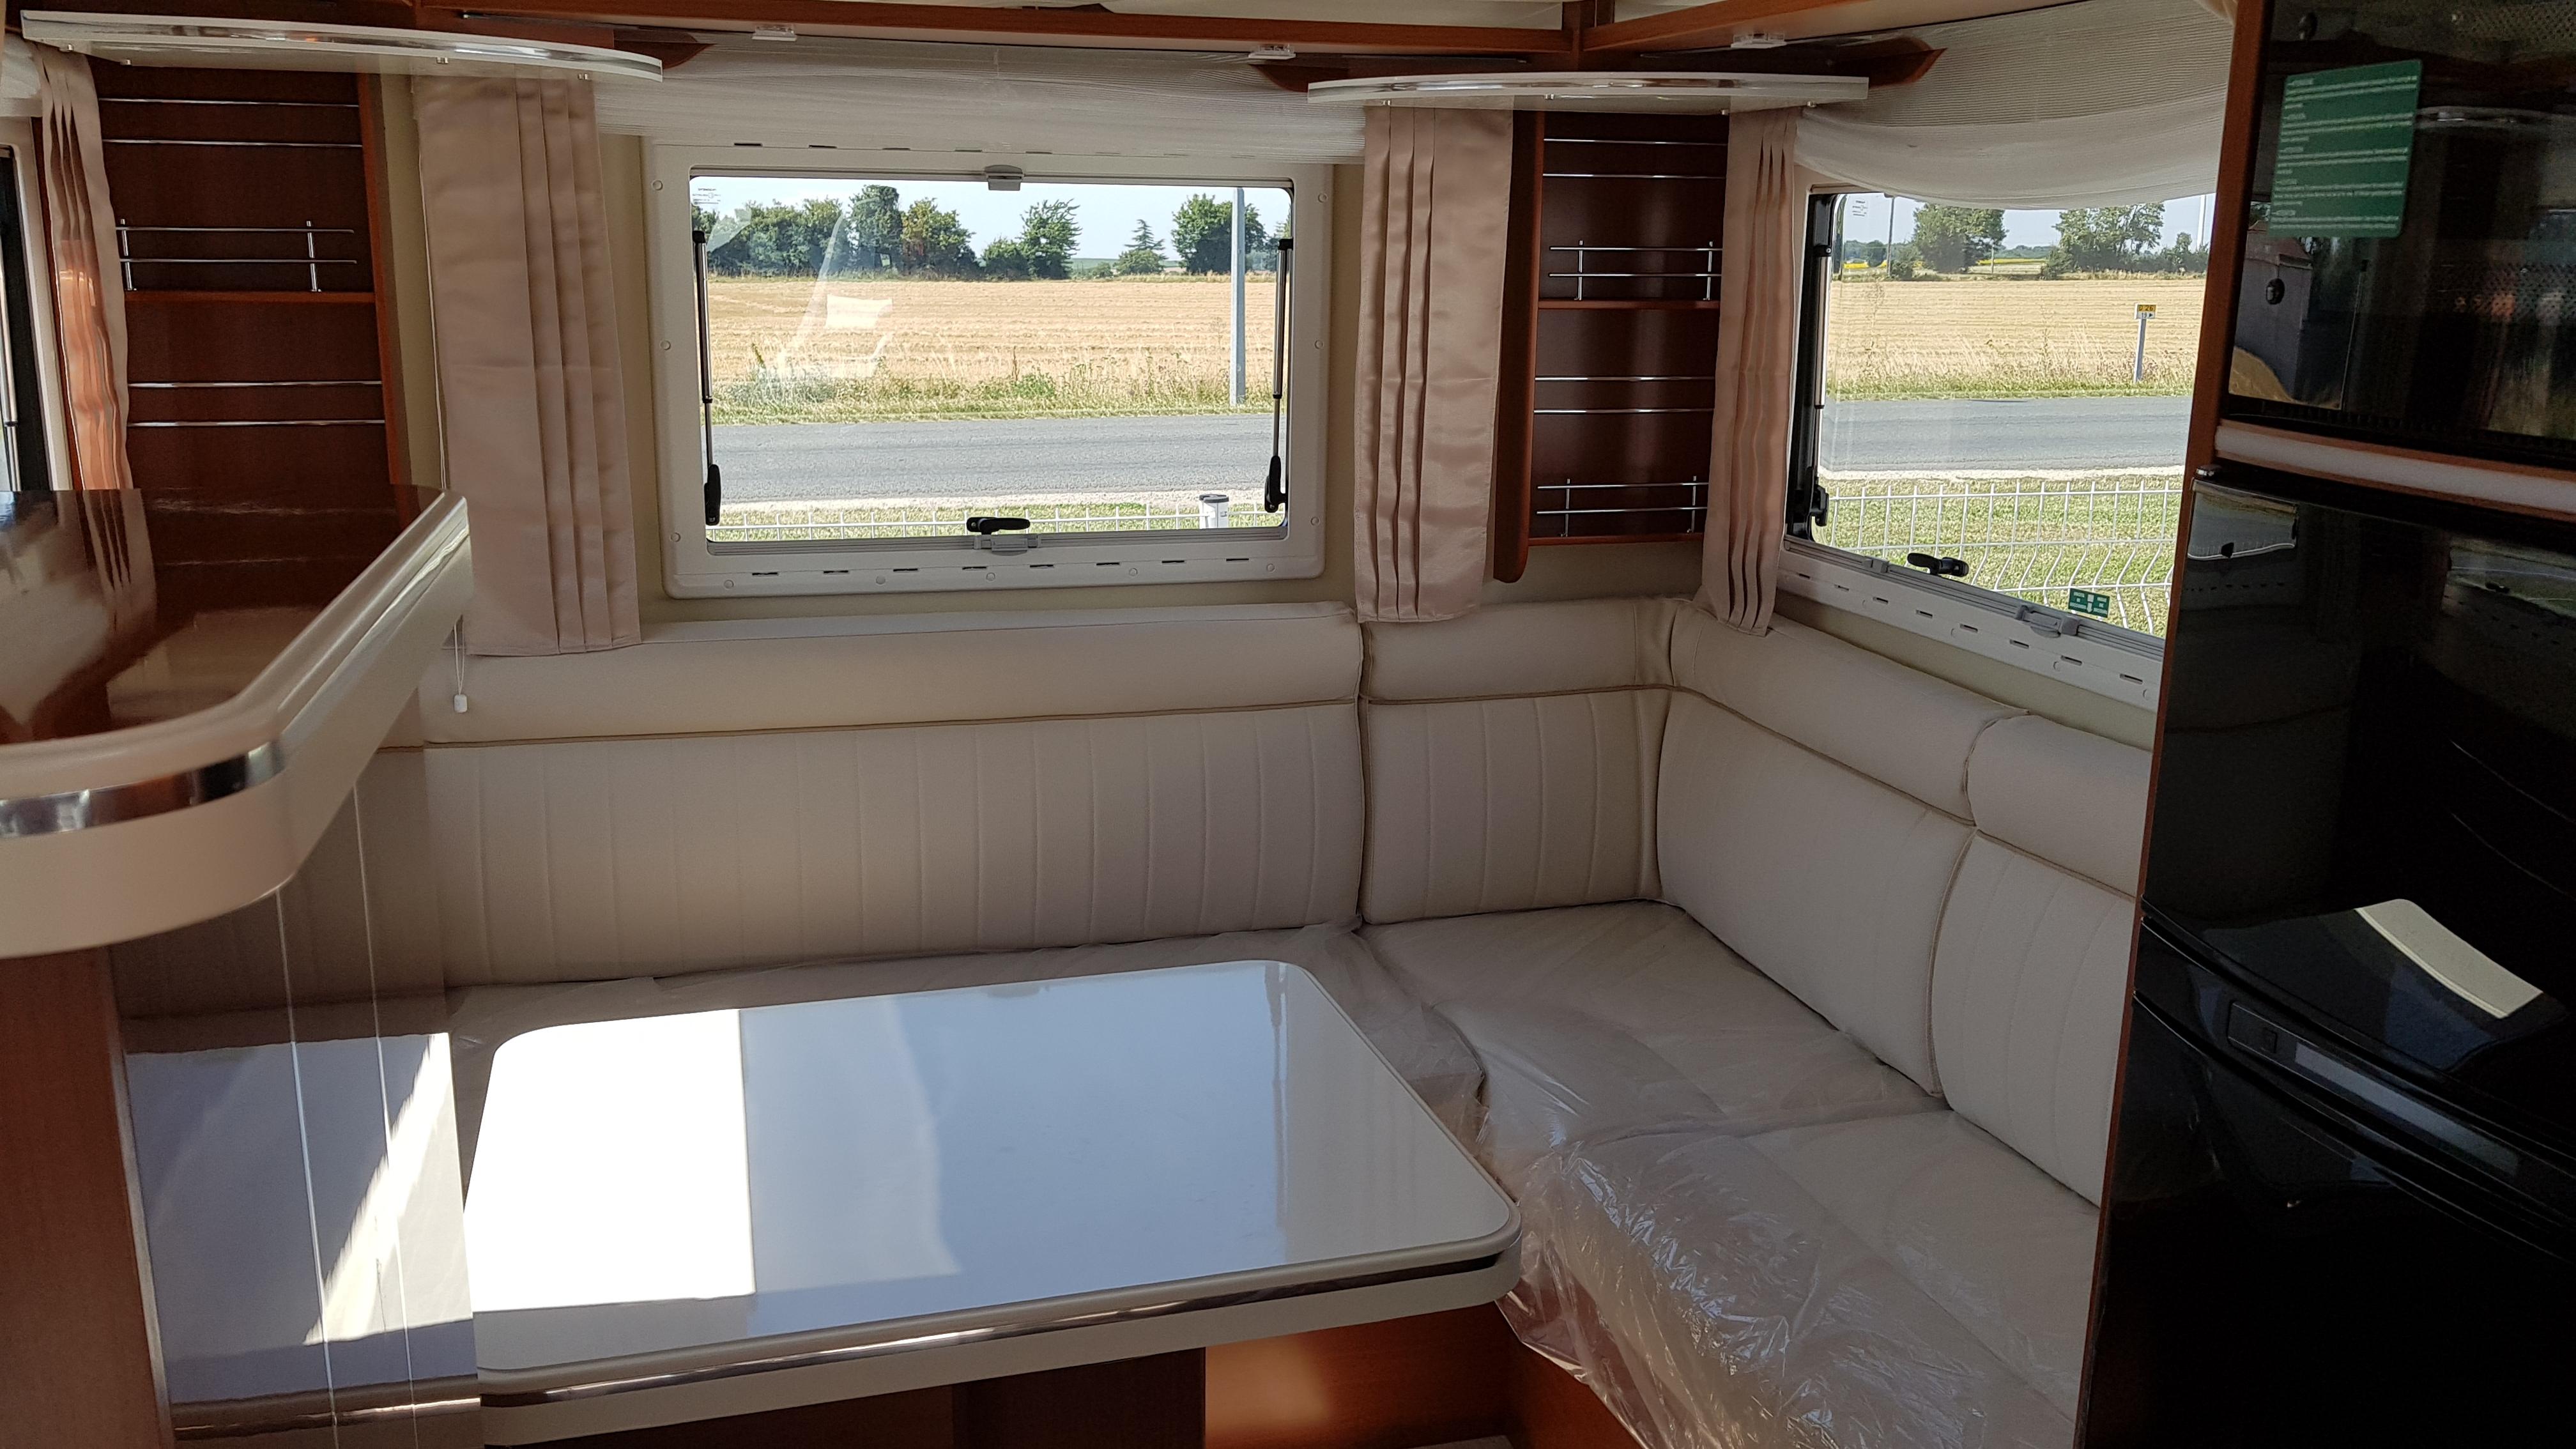 mobilvetta k yacht 80 tekno line neuf de 2018 - fiat - camping car en vente  u00e0 ruffec  charente